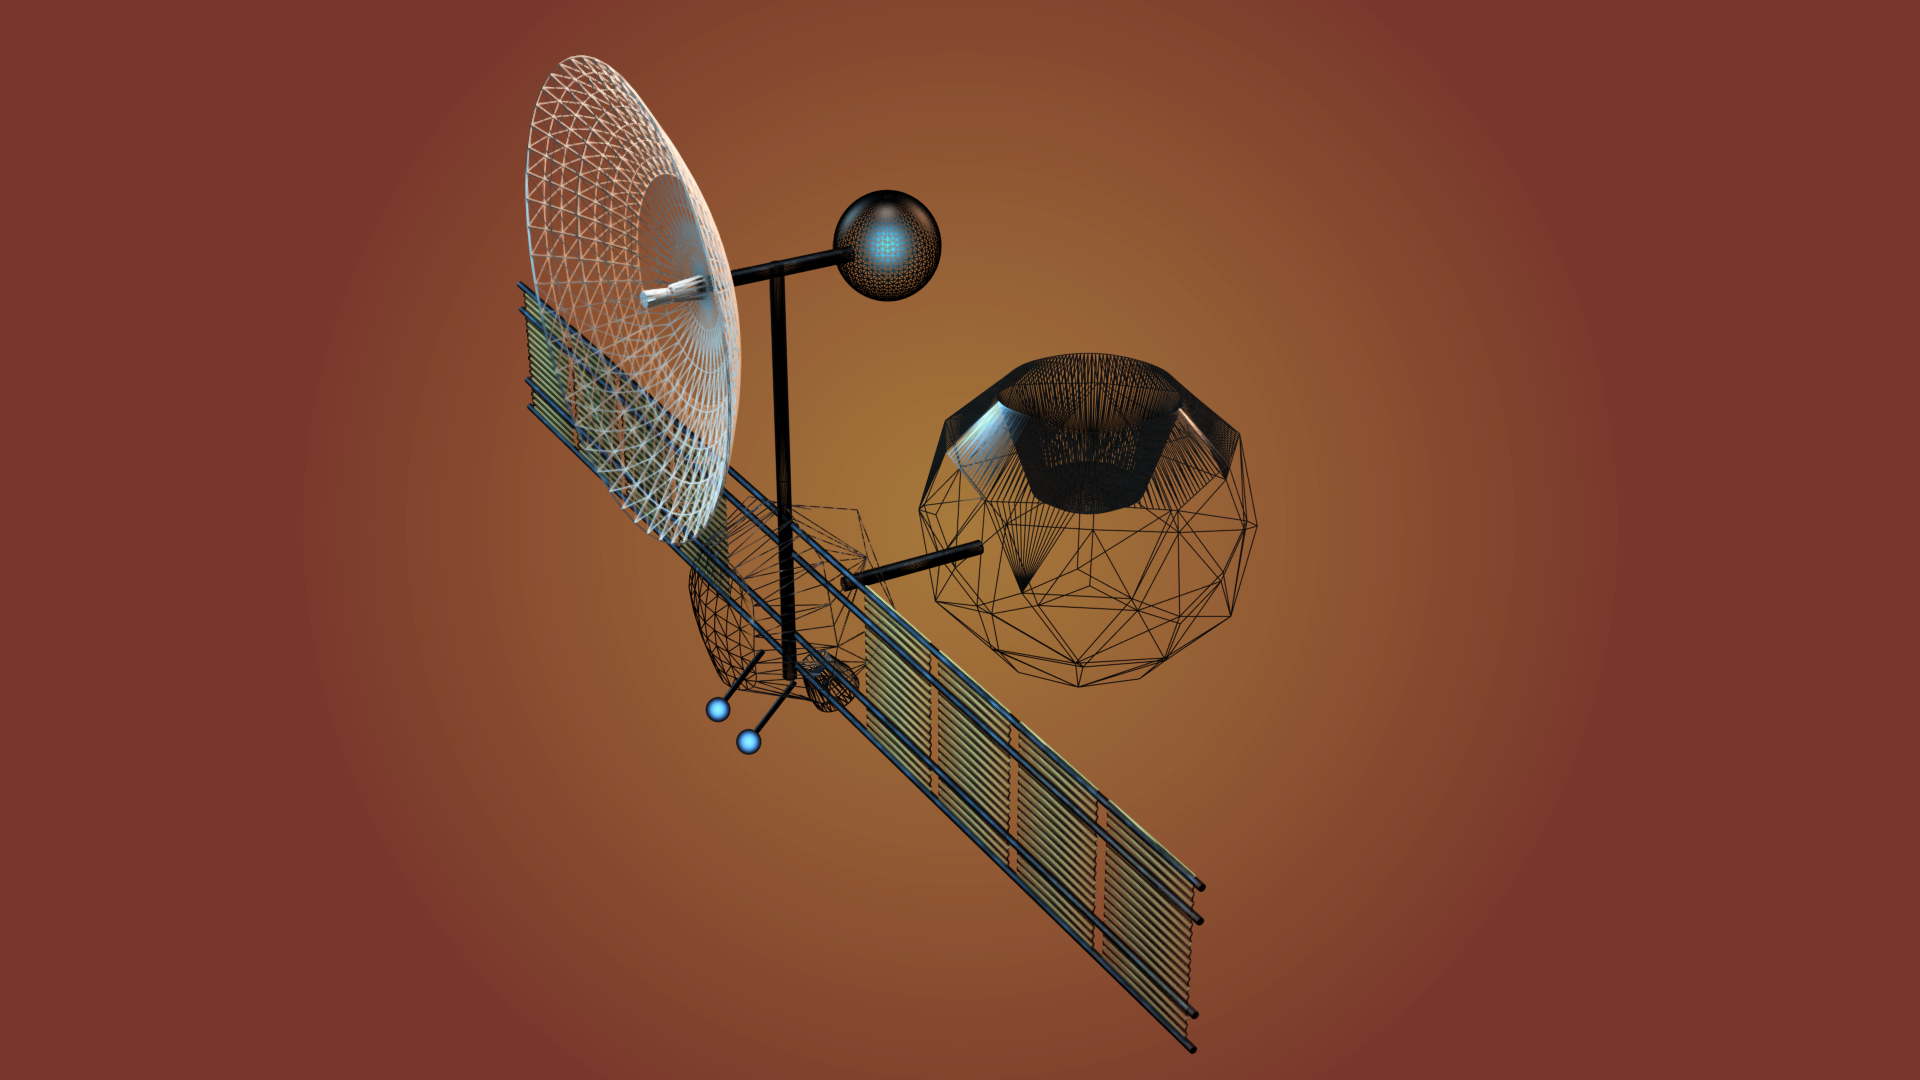 space probe models - photo #17